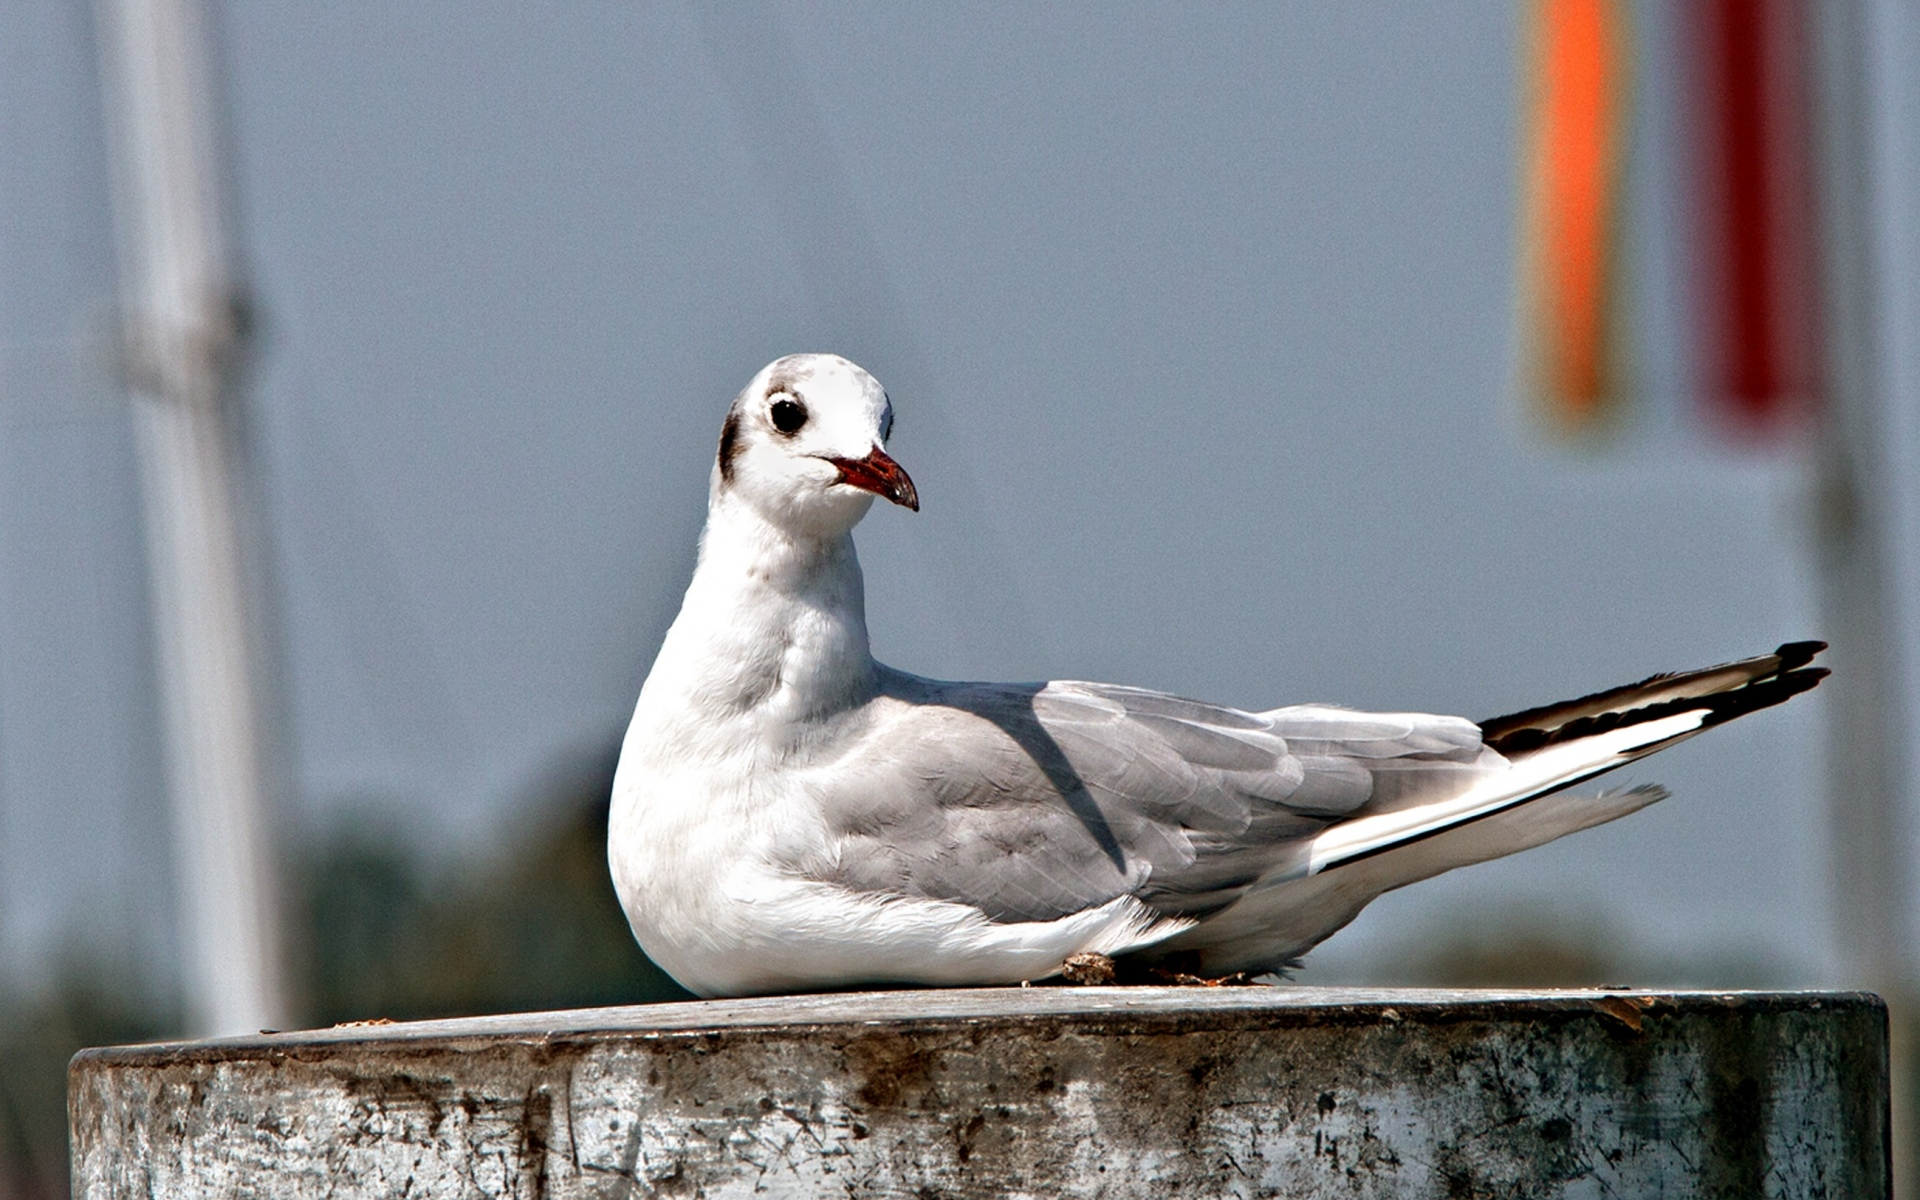 Картинки чайка, птица, сидя, клюв фото и обои на рабочий стол